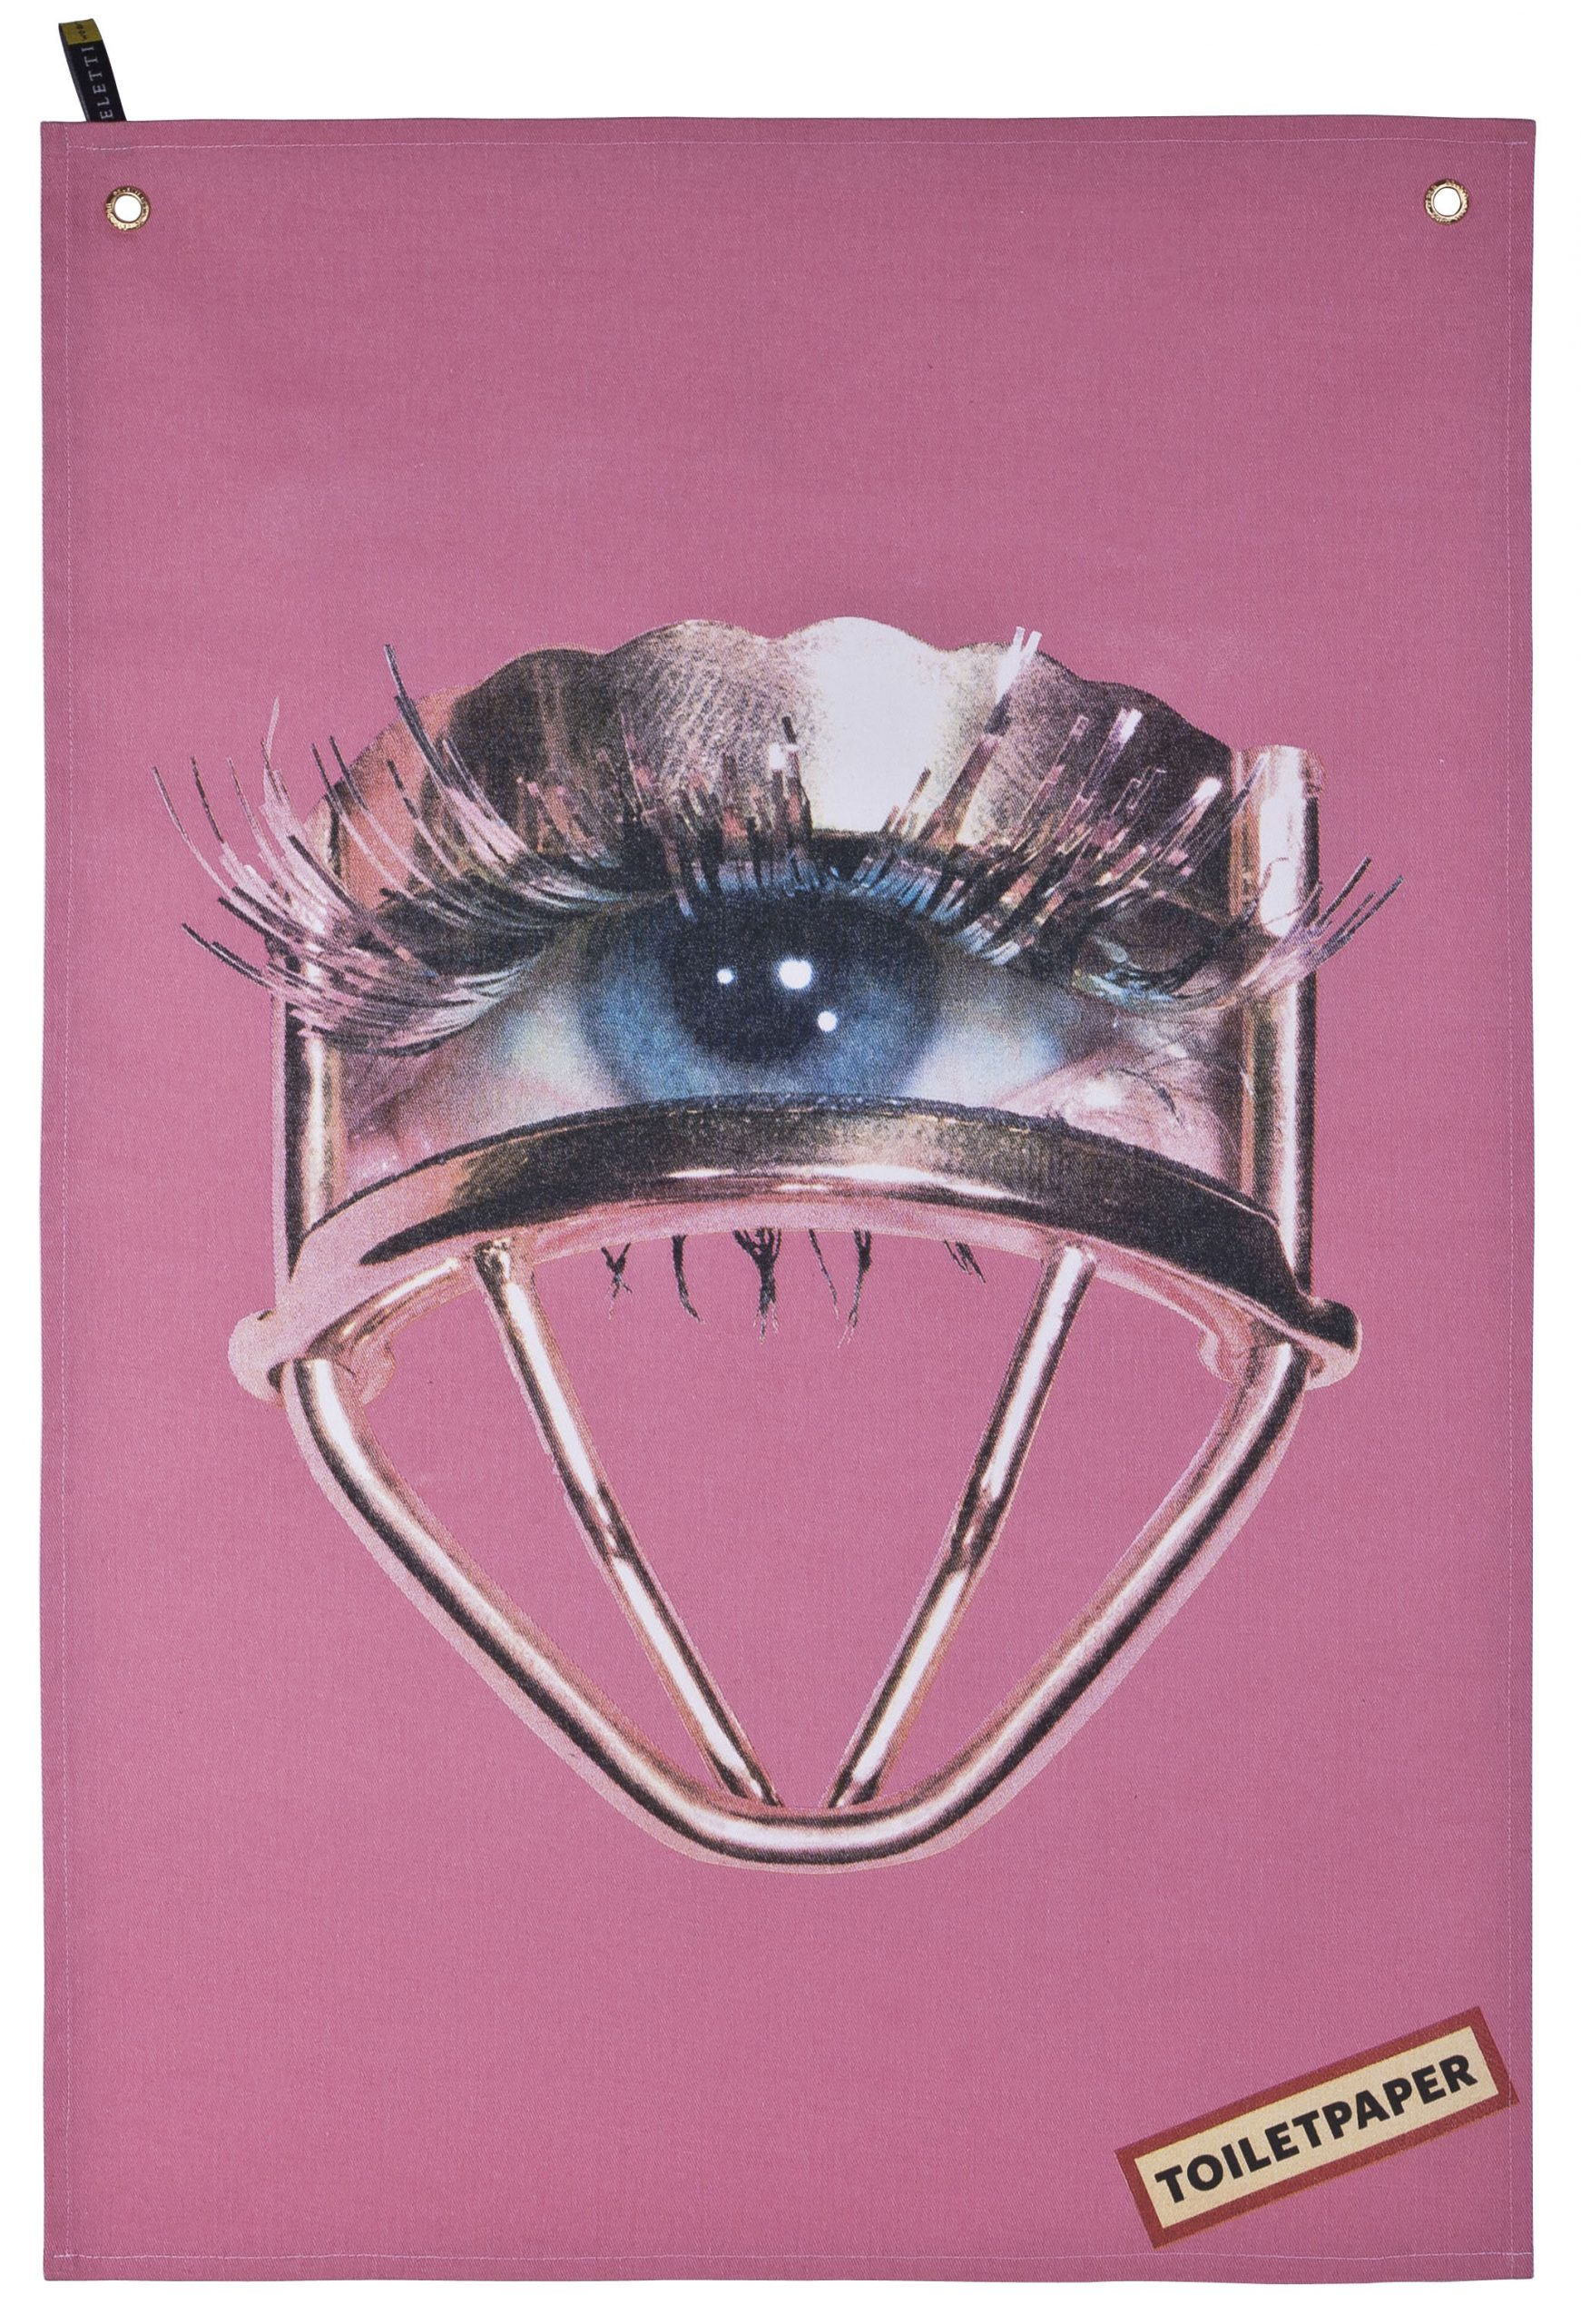 Plat de papier de toilette - Oeil multicolore | Rosa Seletti Maurizio Cattelan | Pierpaolo Ferrari